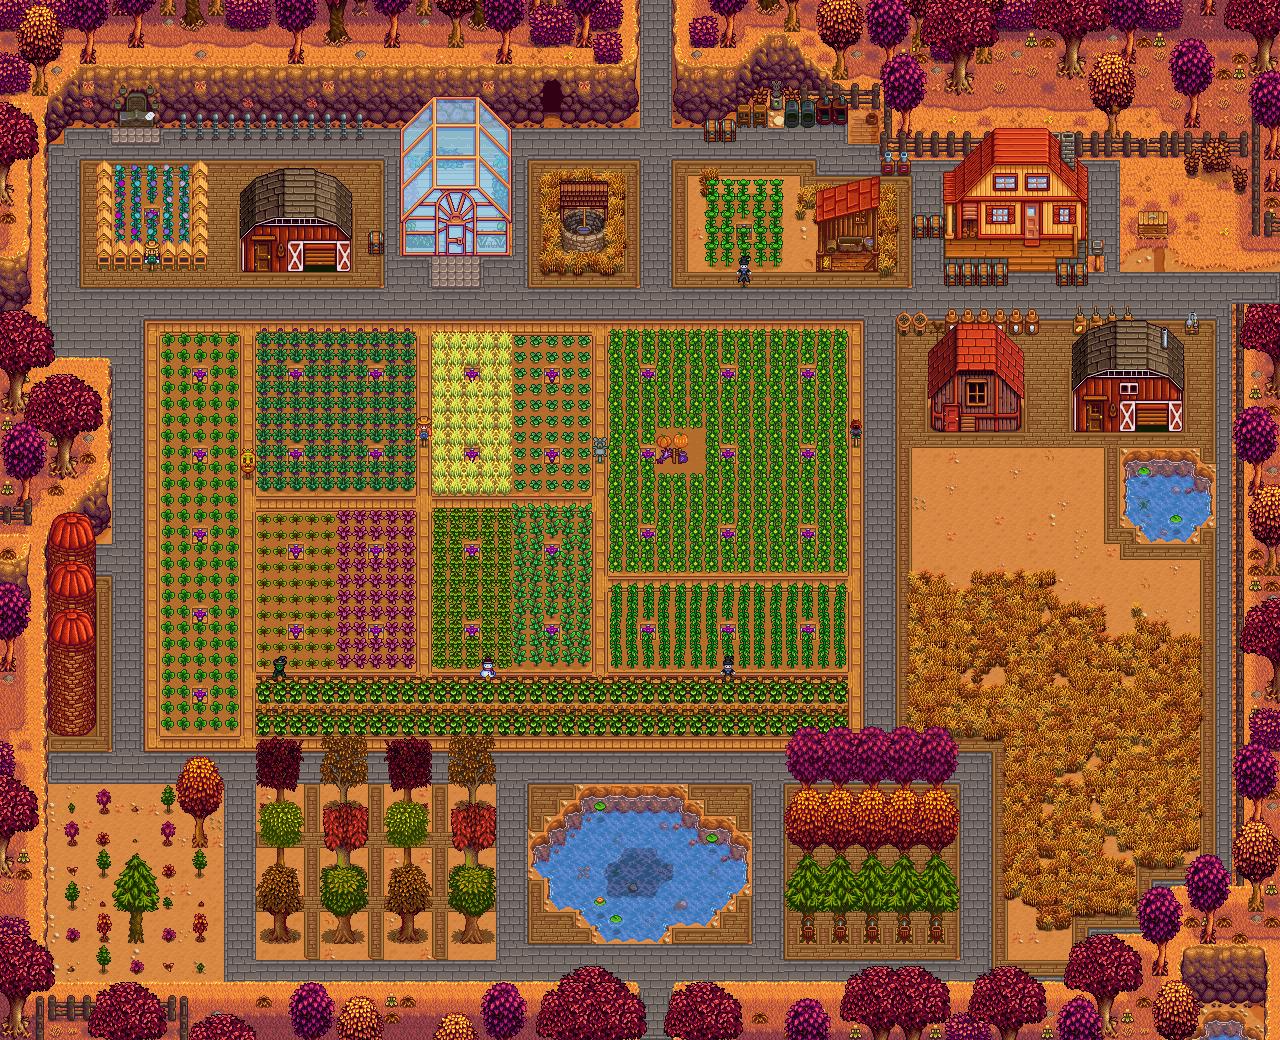 Lonely tree farm stardew valley summary - Sims 3 spielideen ...